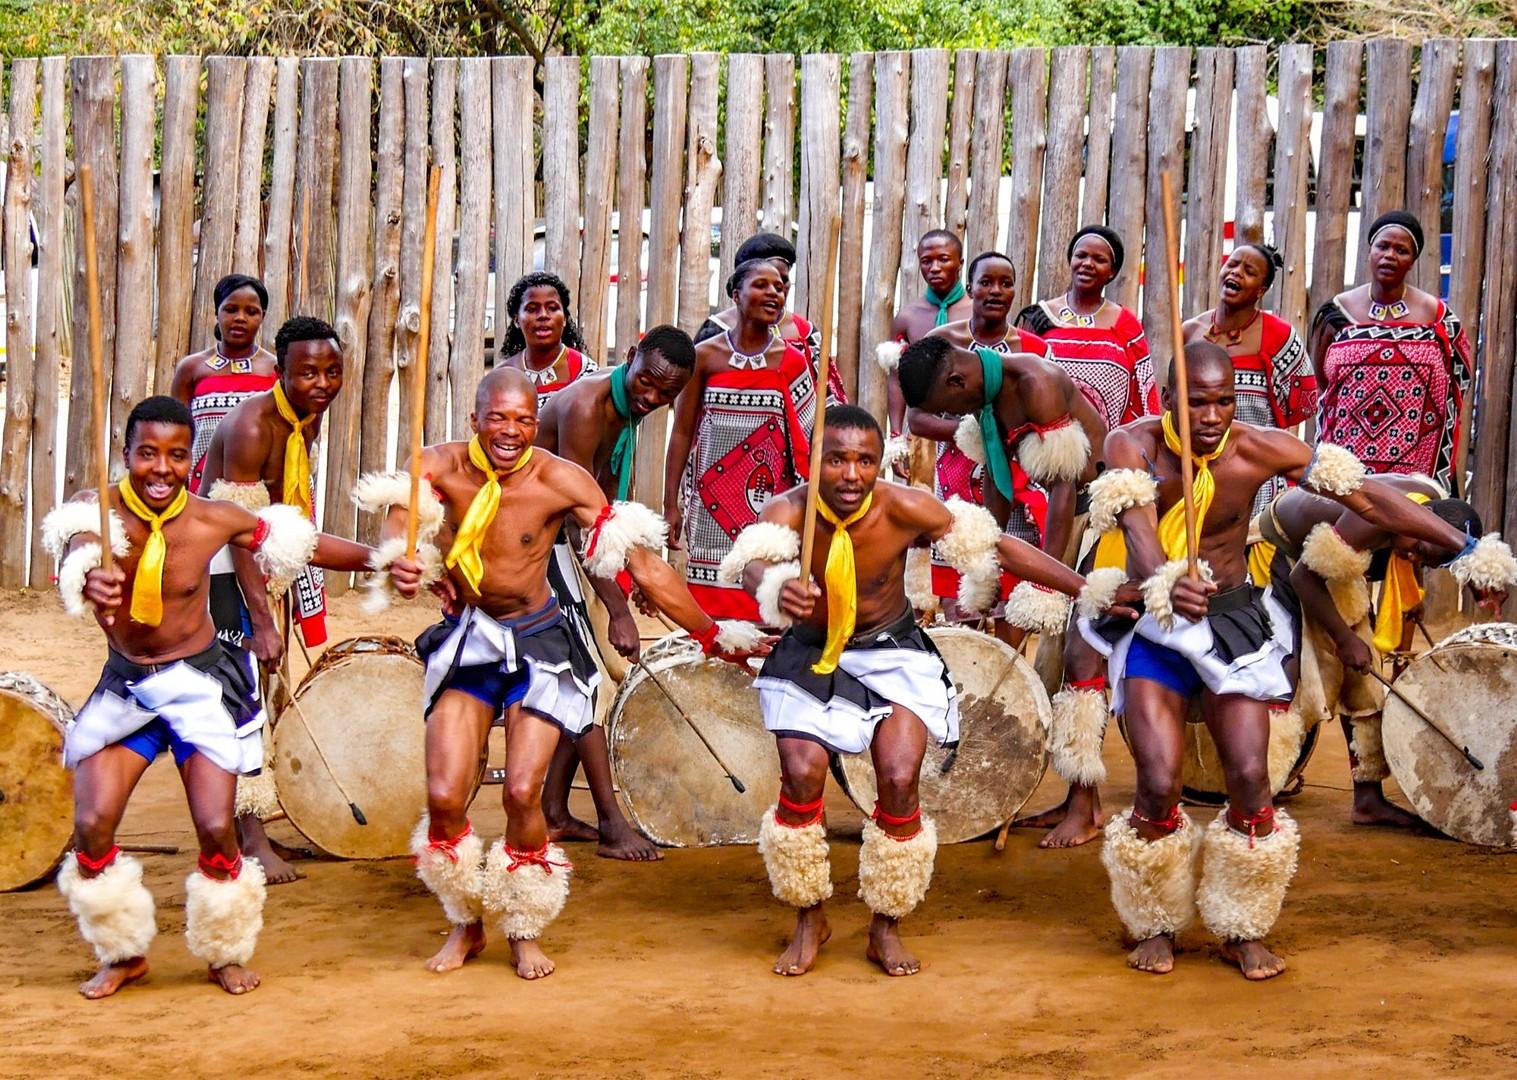 rgfdgfg1.jpg - Eswatini (Swaziland) - Cycling Safari - Cycling Adventures